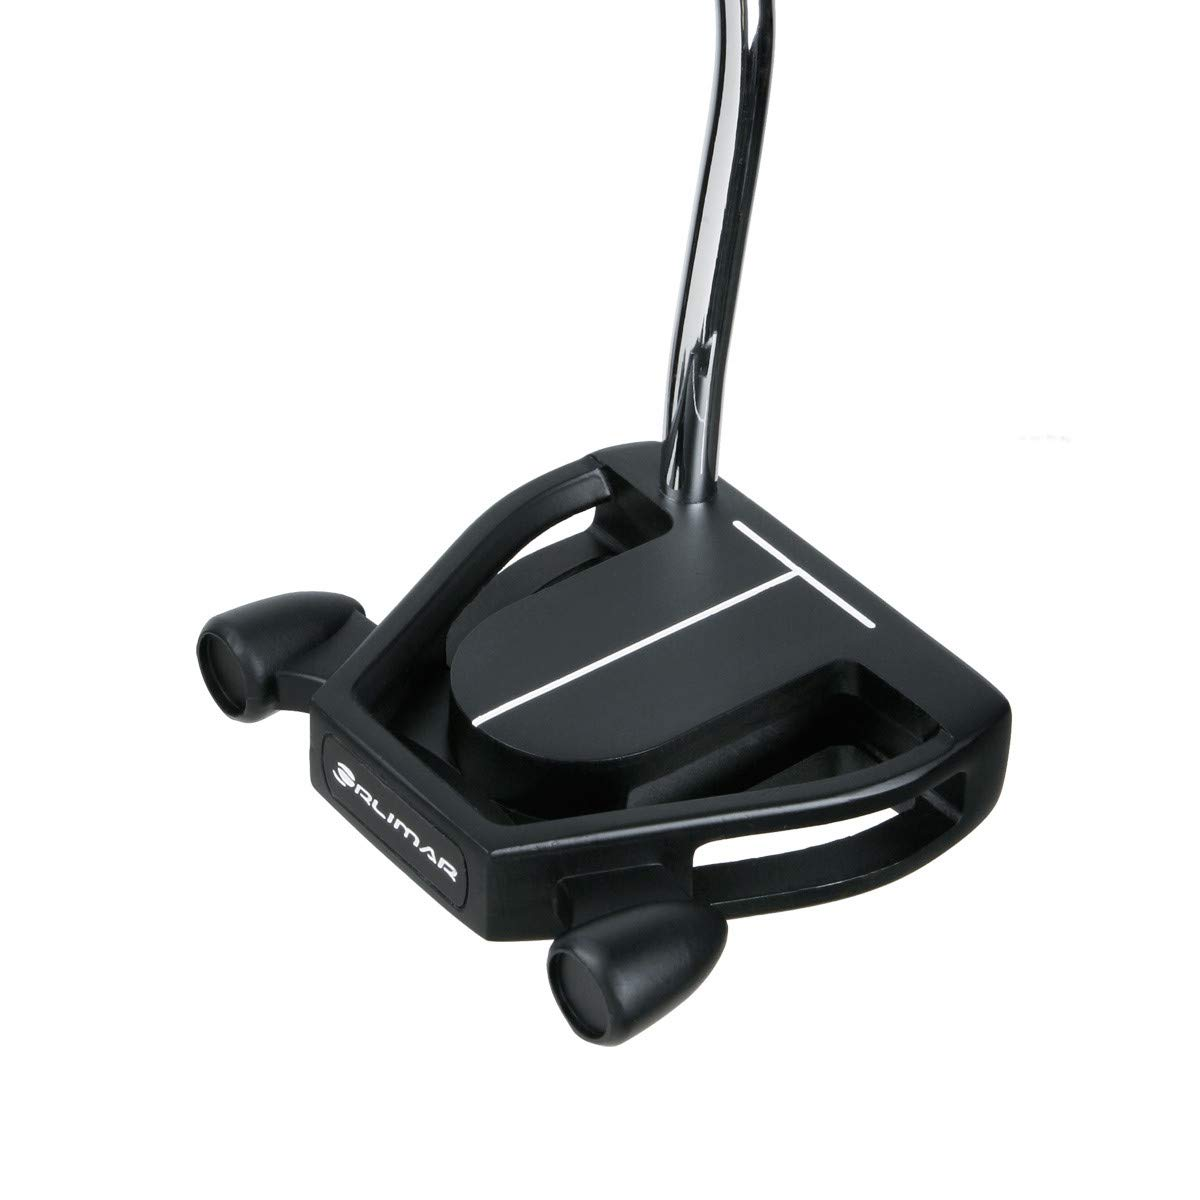 Amazon.com: Orlimar F80 - Putter (35.0 in), color negro y ...